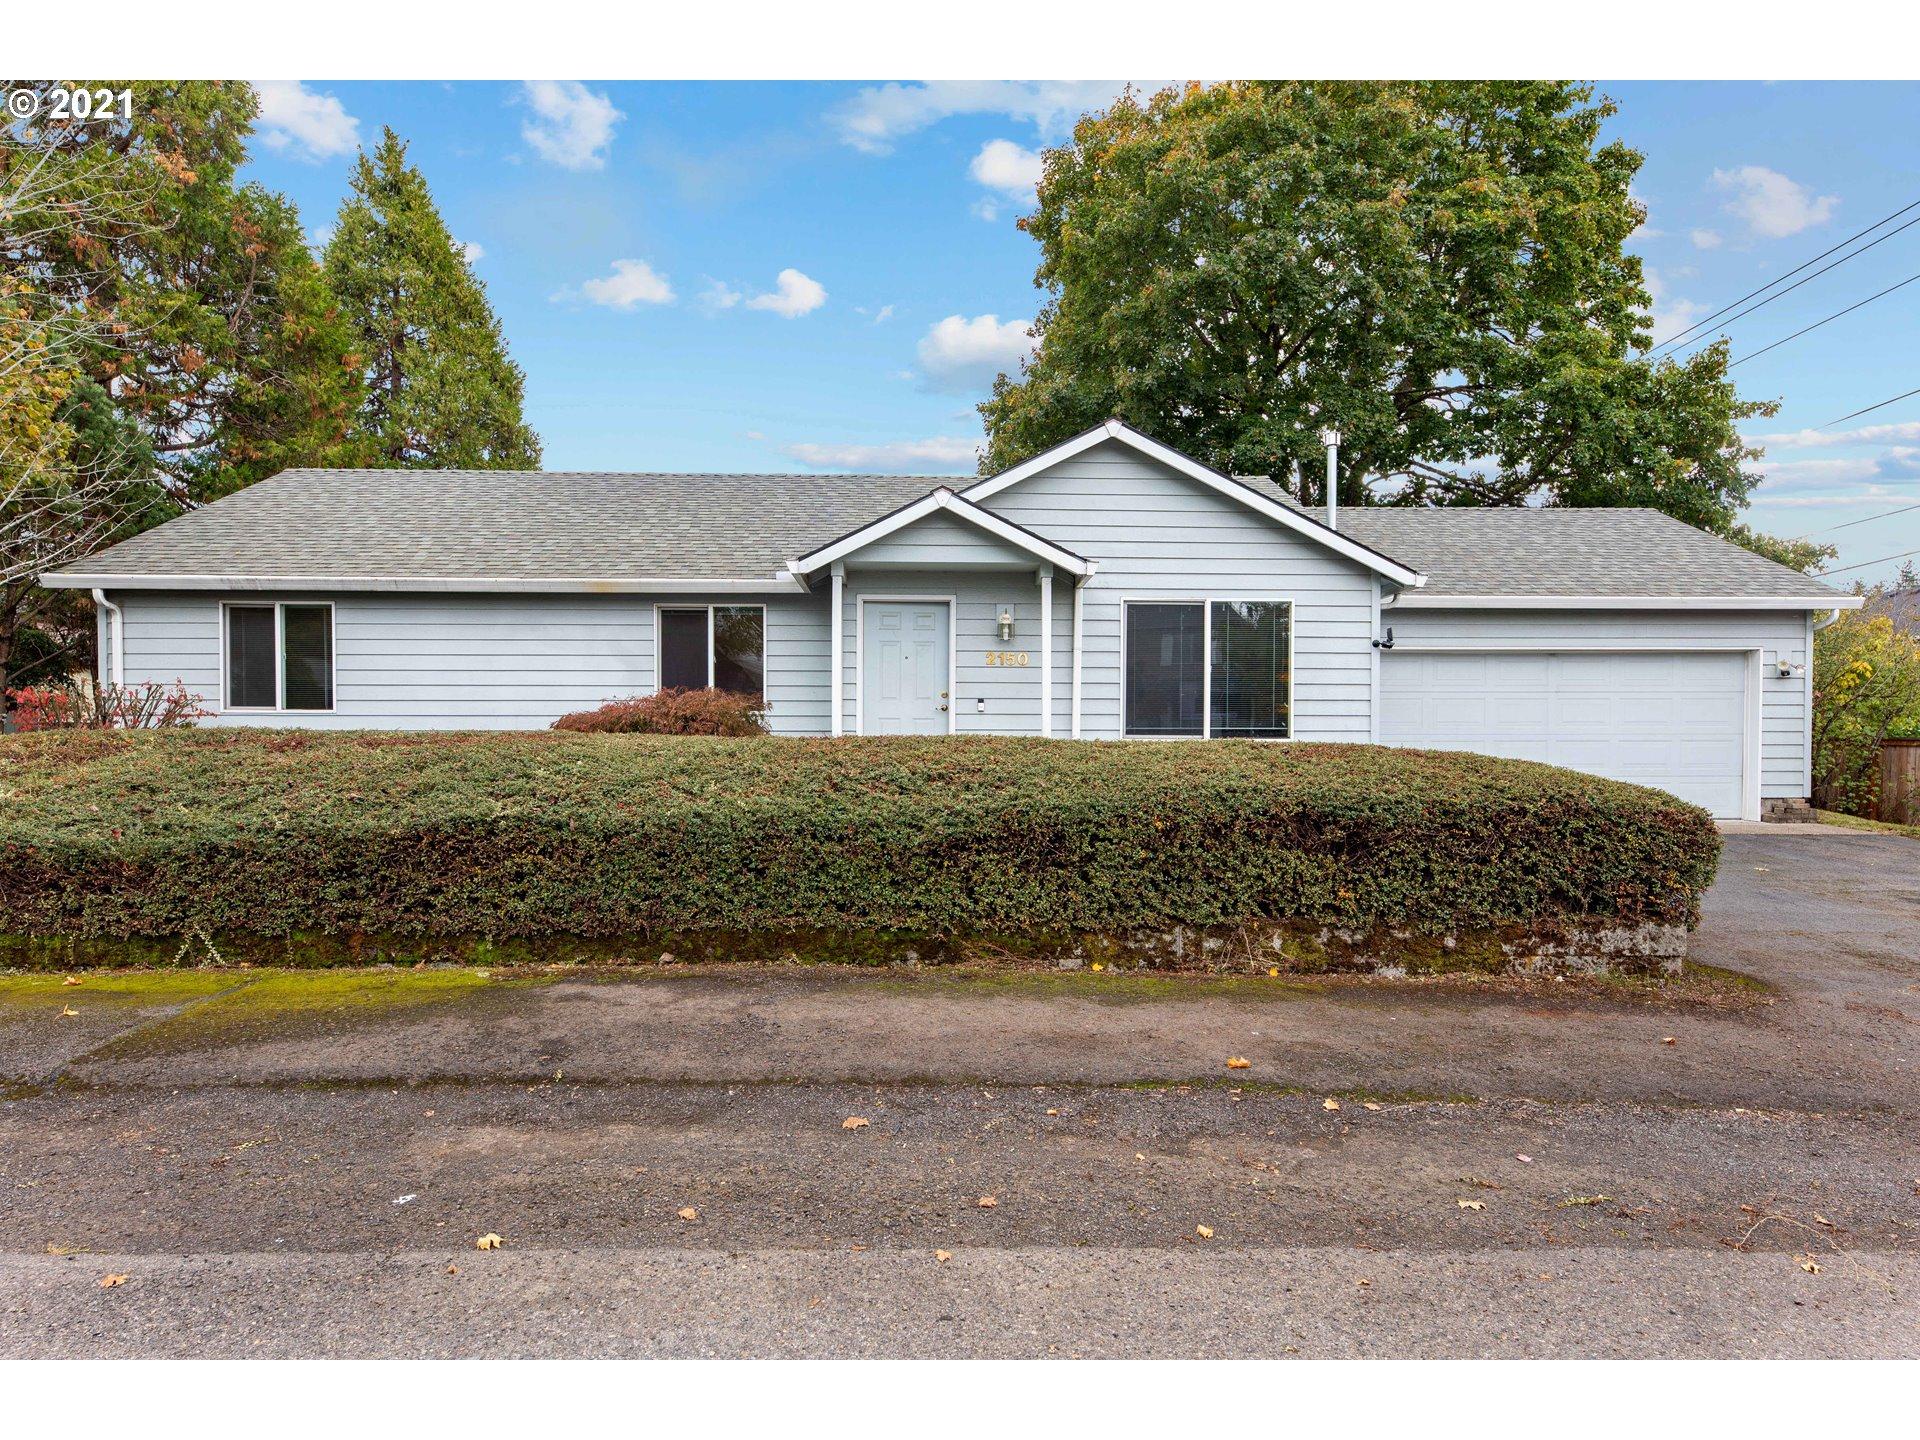 2150 SE 174TH AVE, Portland OR 97233